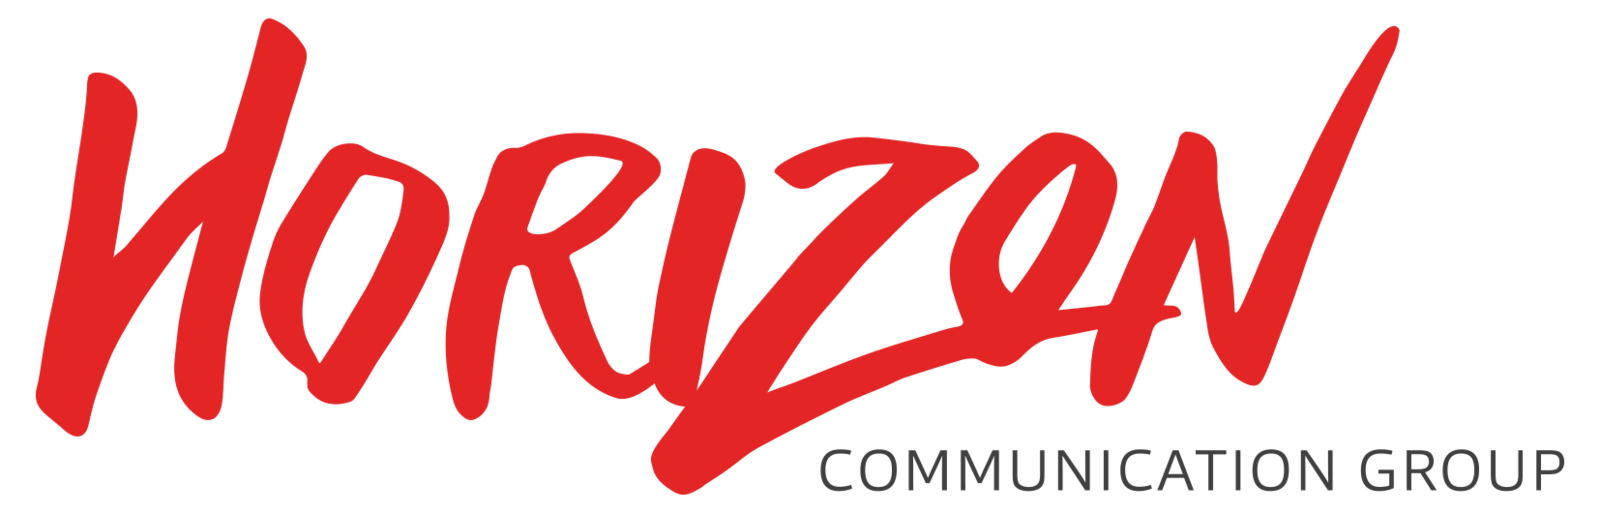 Horizon Communications Group